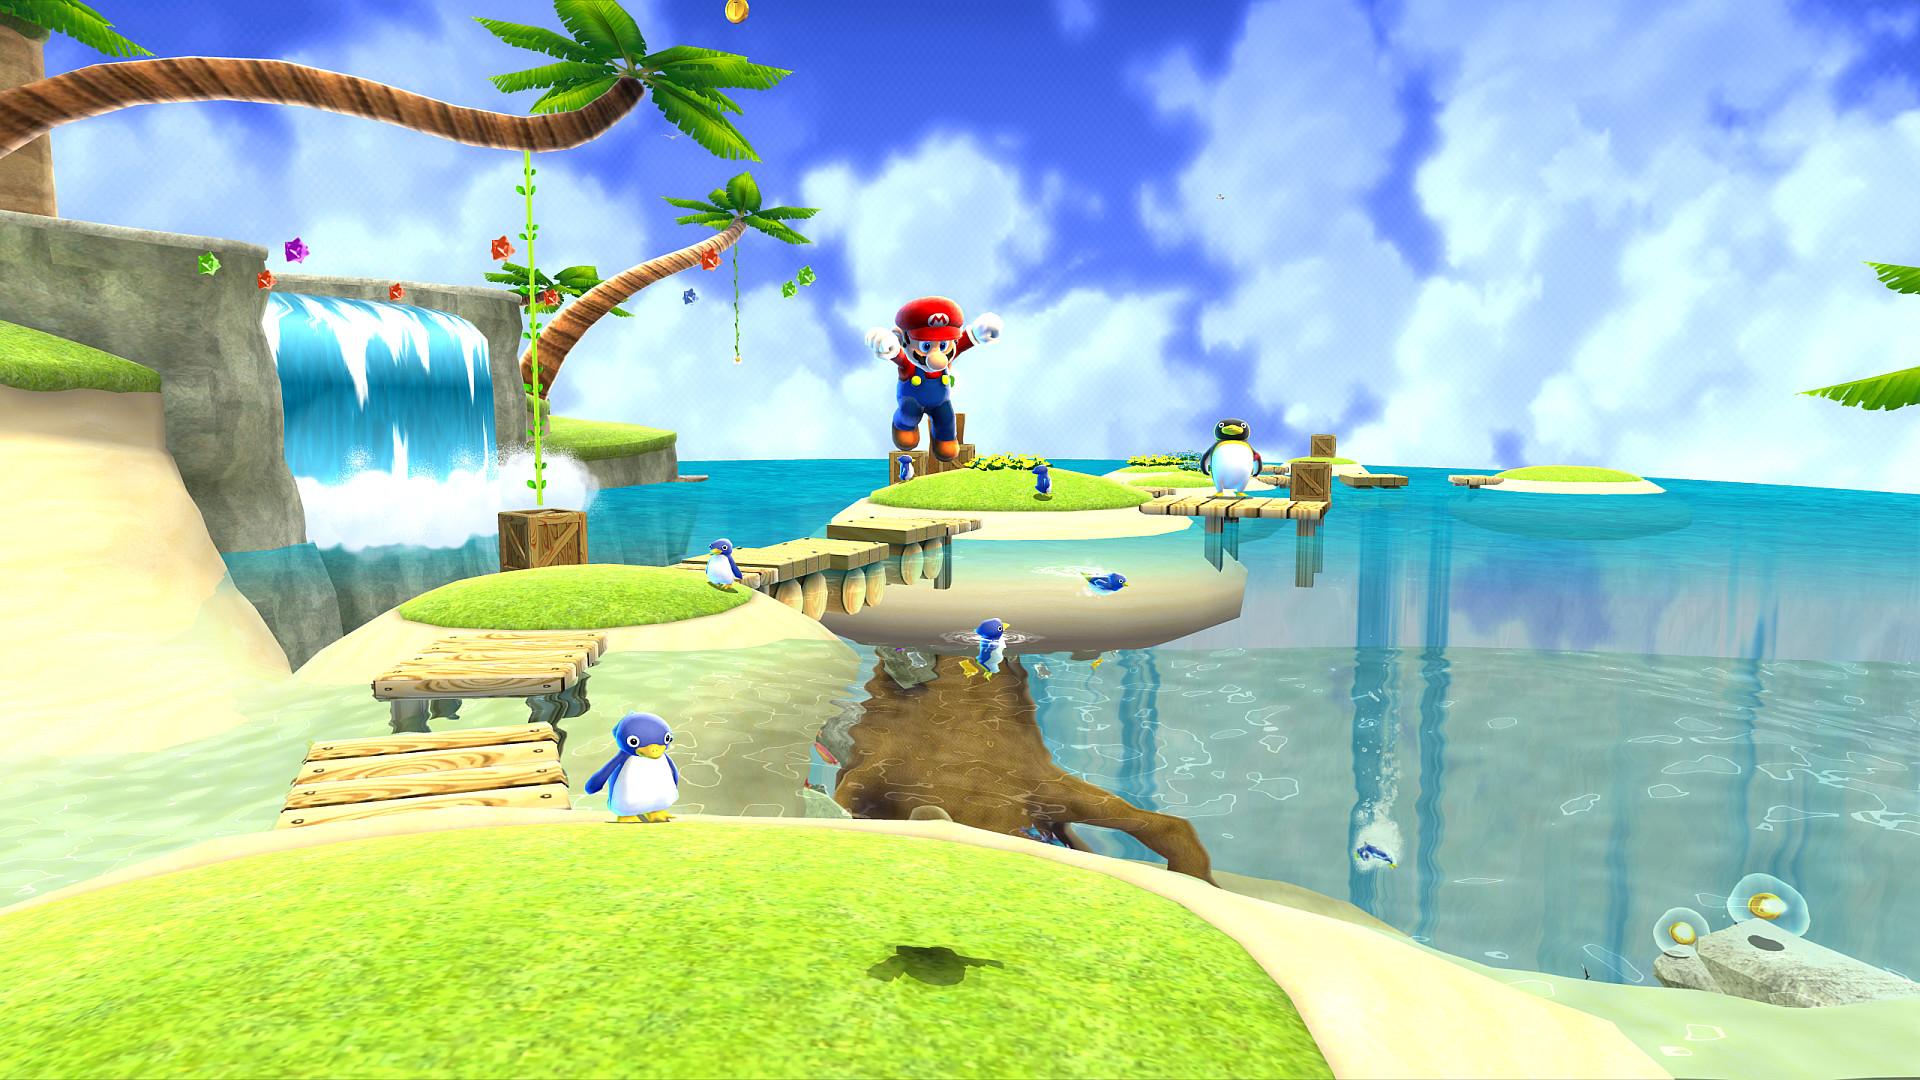 Video Game – Super Mario Galaxy Wallpaper